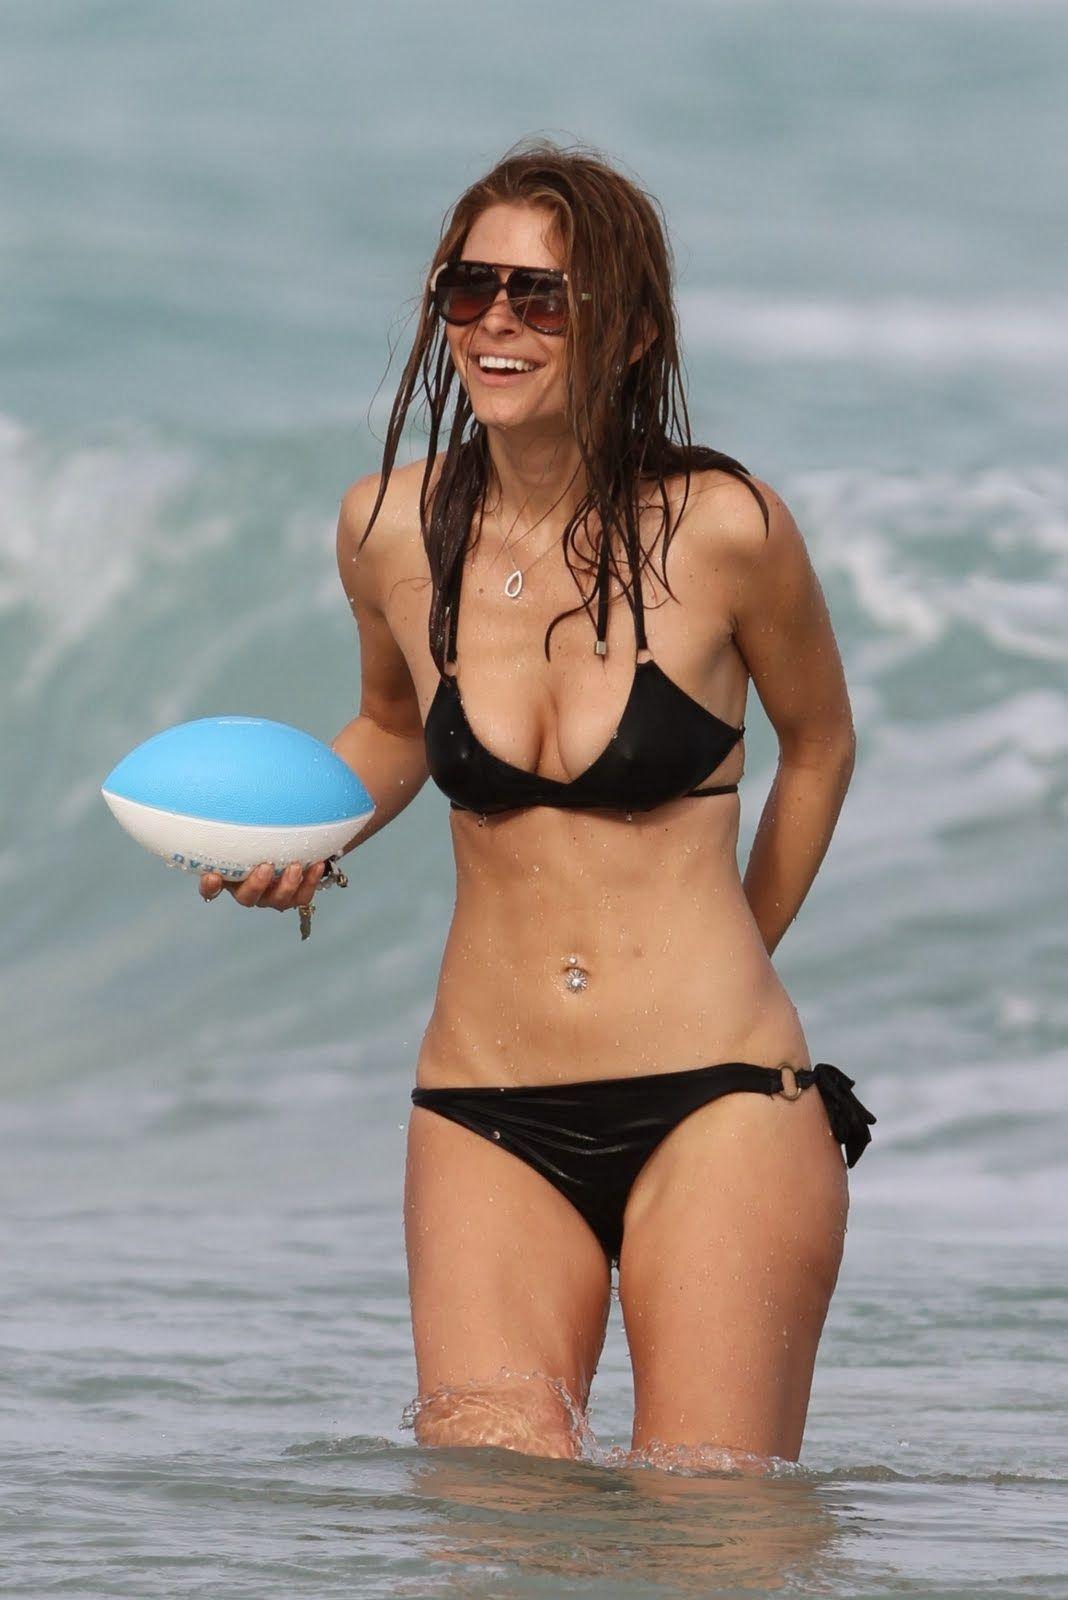 maria+menounos+bikini+candids+pussy-slip+wardrobe+malfunction+in+